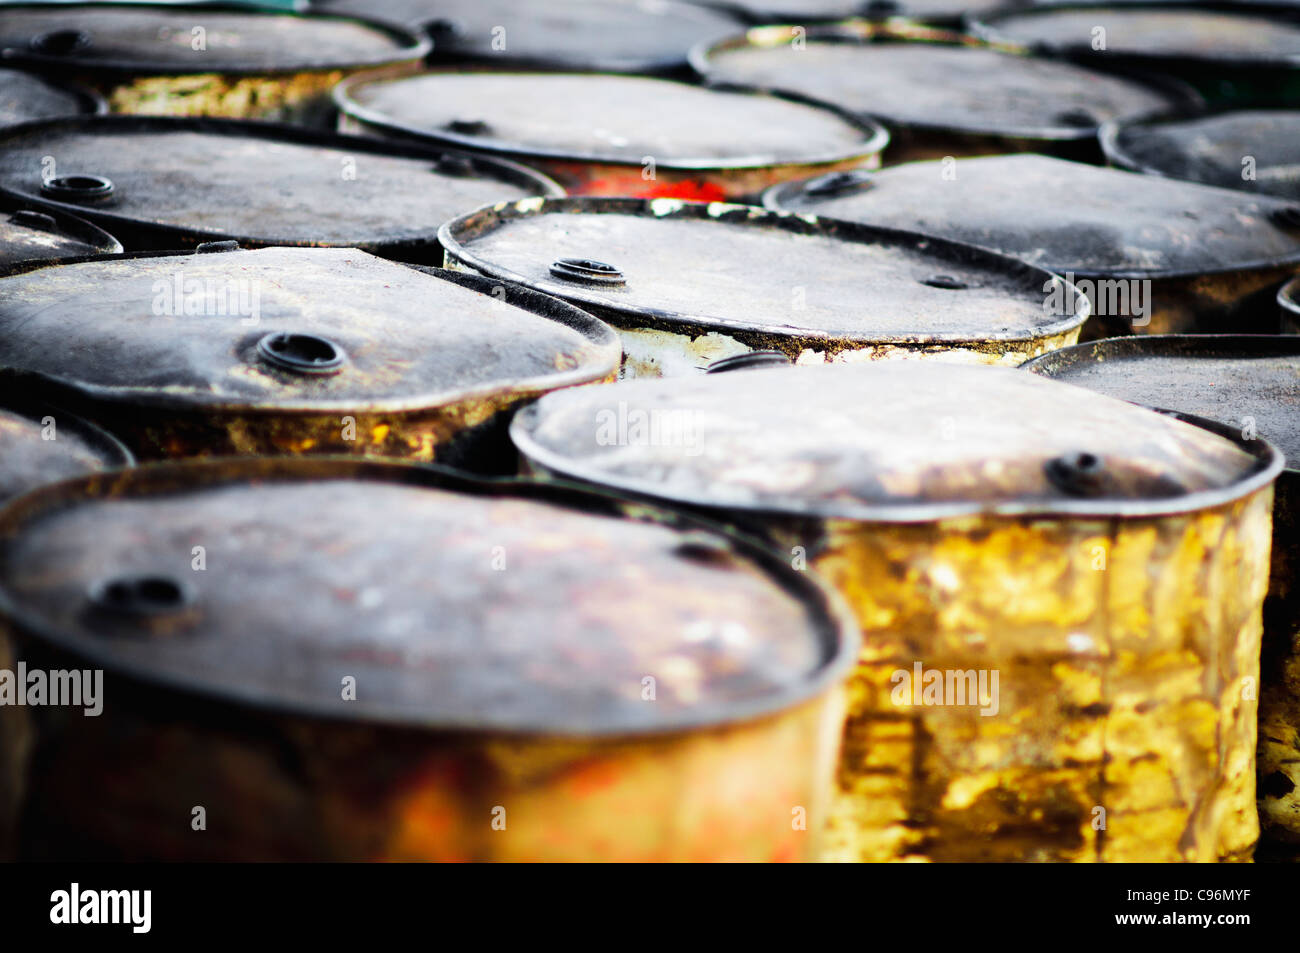 Rusty Barrel Öl am Strand Stockbild